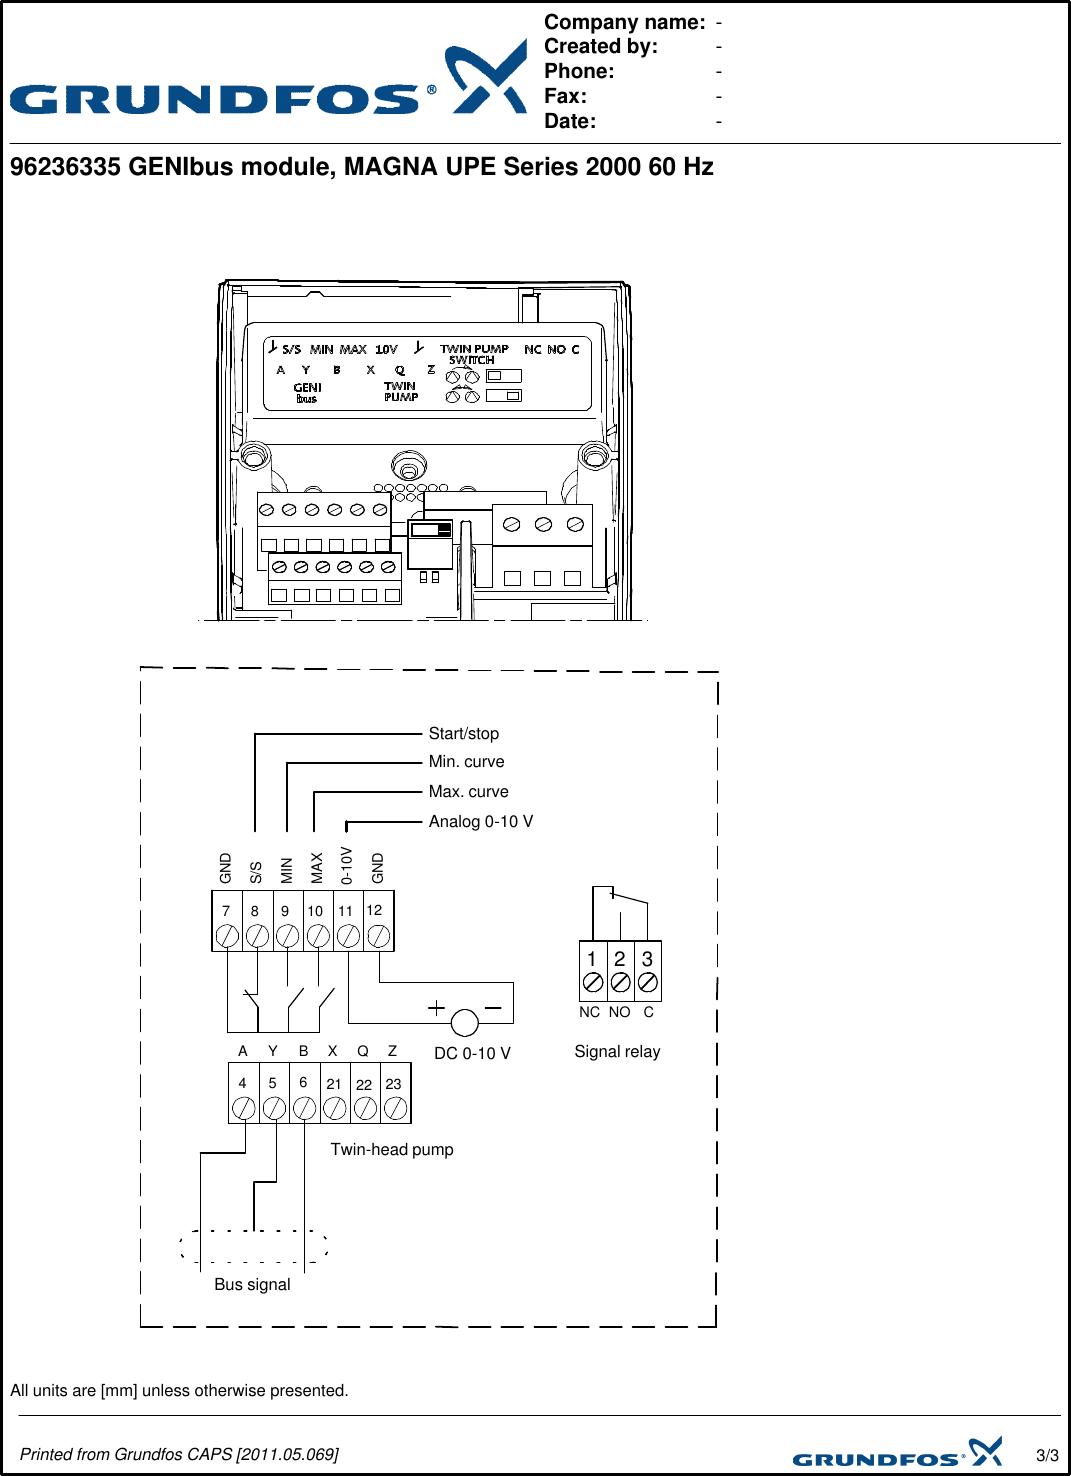 Grundfos Wiring Diagram - Subaru Wiring Harness -  contuor.yenpancane.jeanjaures37.fr | Grundfos Wiring Diagrams |  | Wiring Diagram Resource